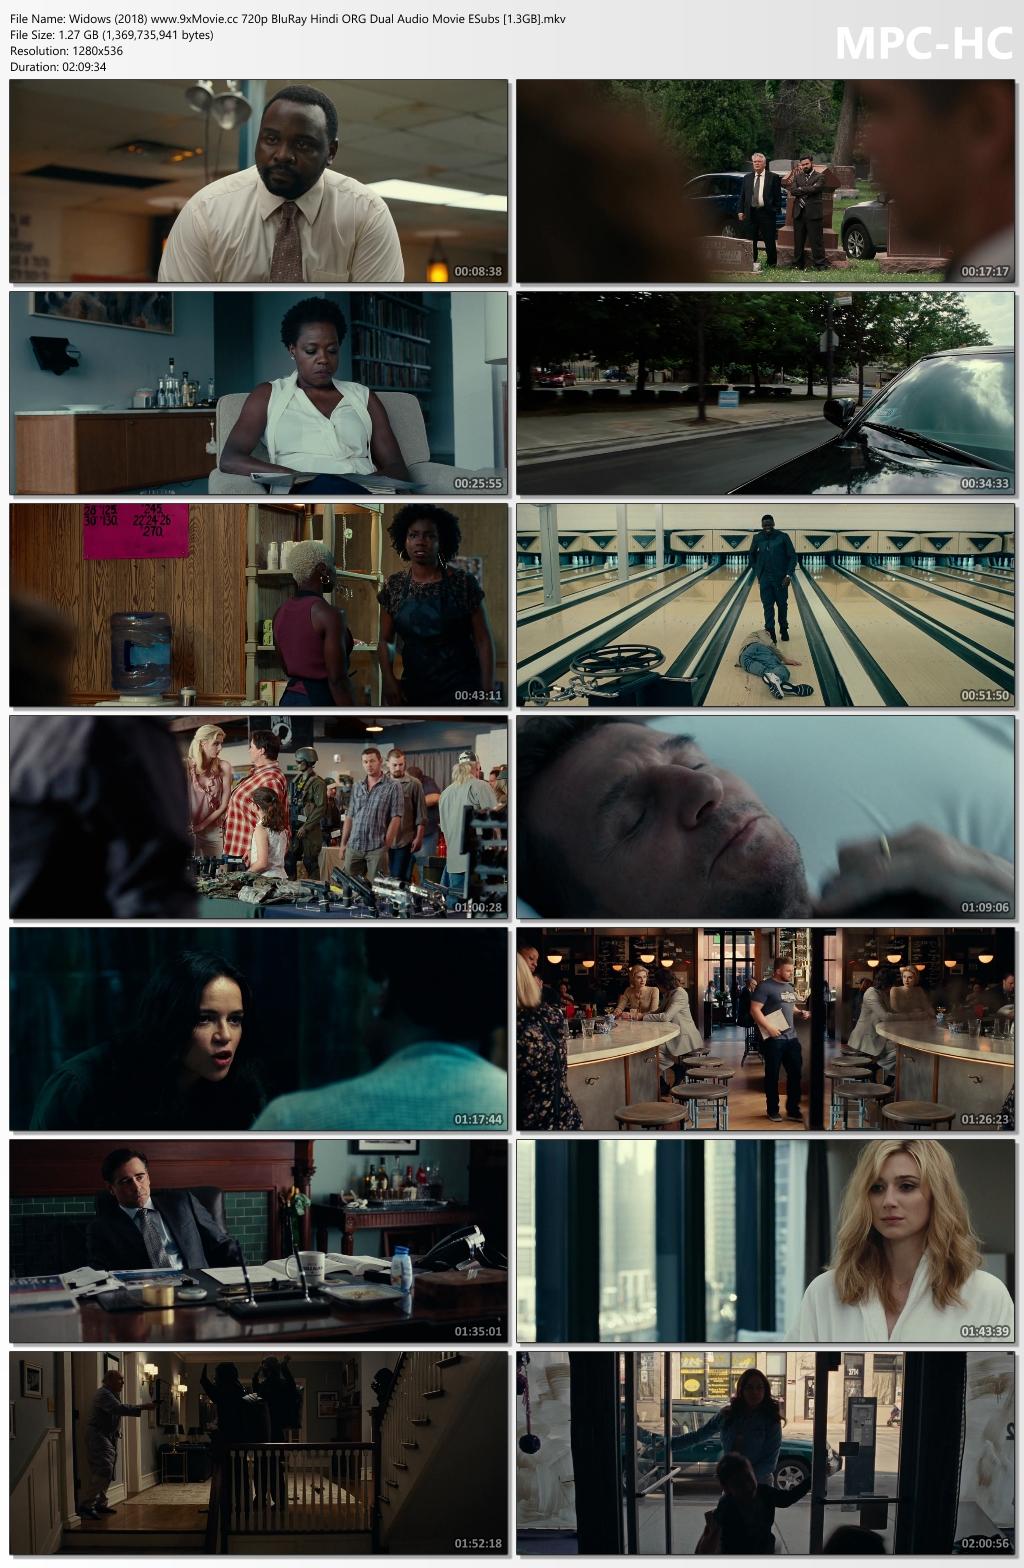 Widows-2018-www-9x-Movie-cc-720p-Blu-Ray-Hindi-ORG-Dual-Audio-Movie-ESubs-1-3-GB-mkv